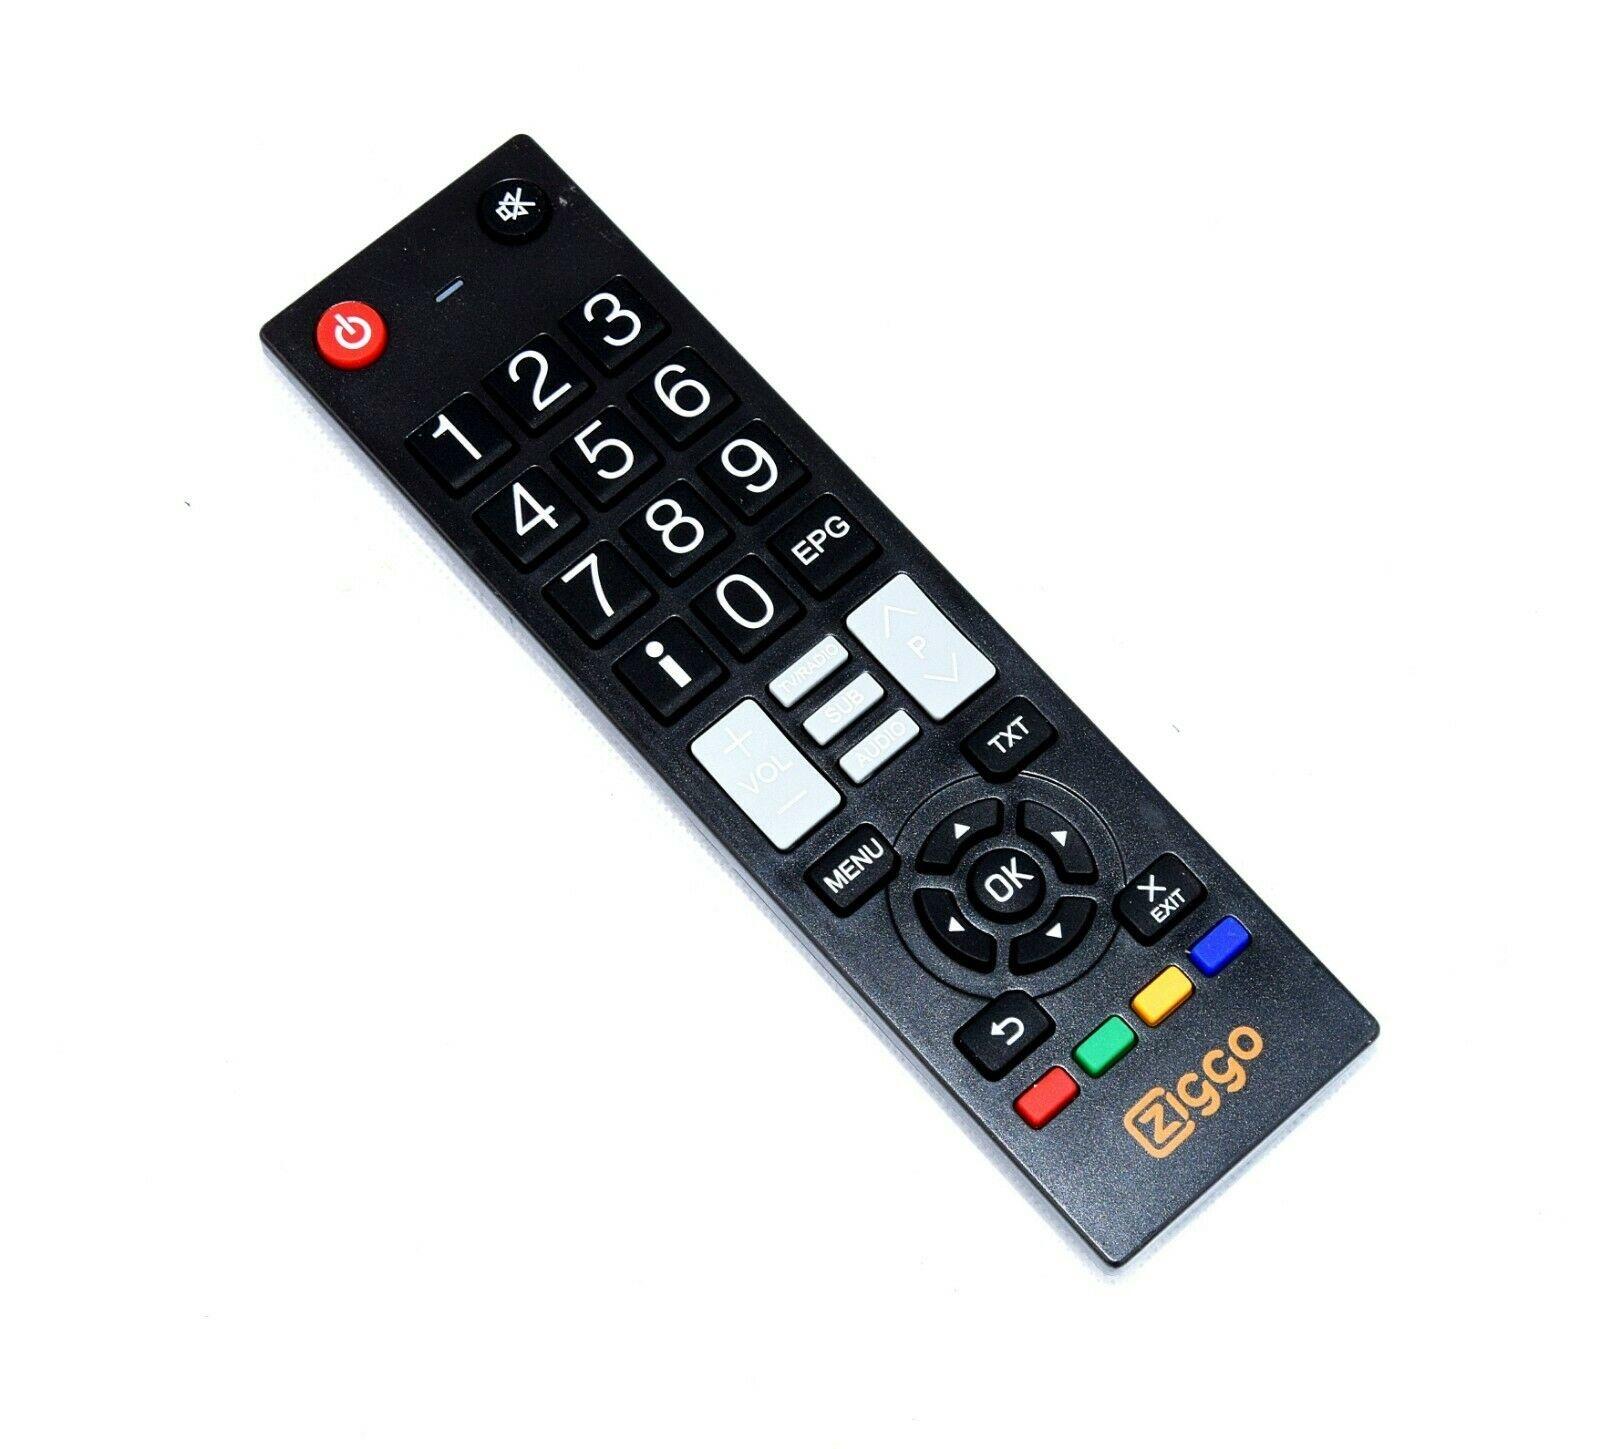 Ziggo ZIGGO Original Fernbedienung Remote Control